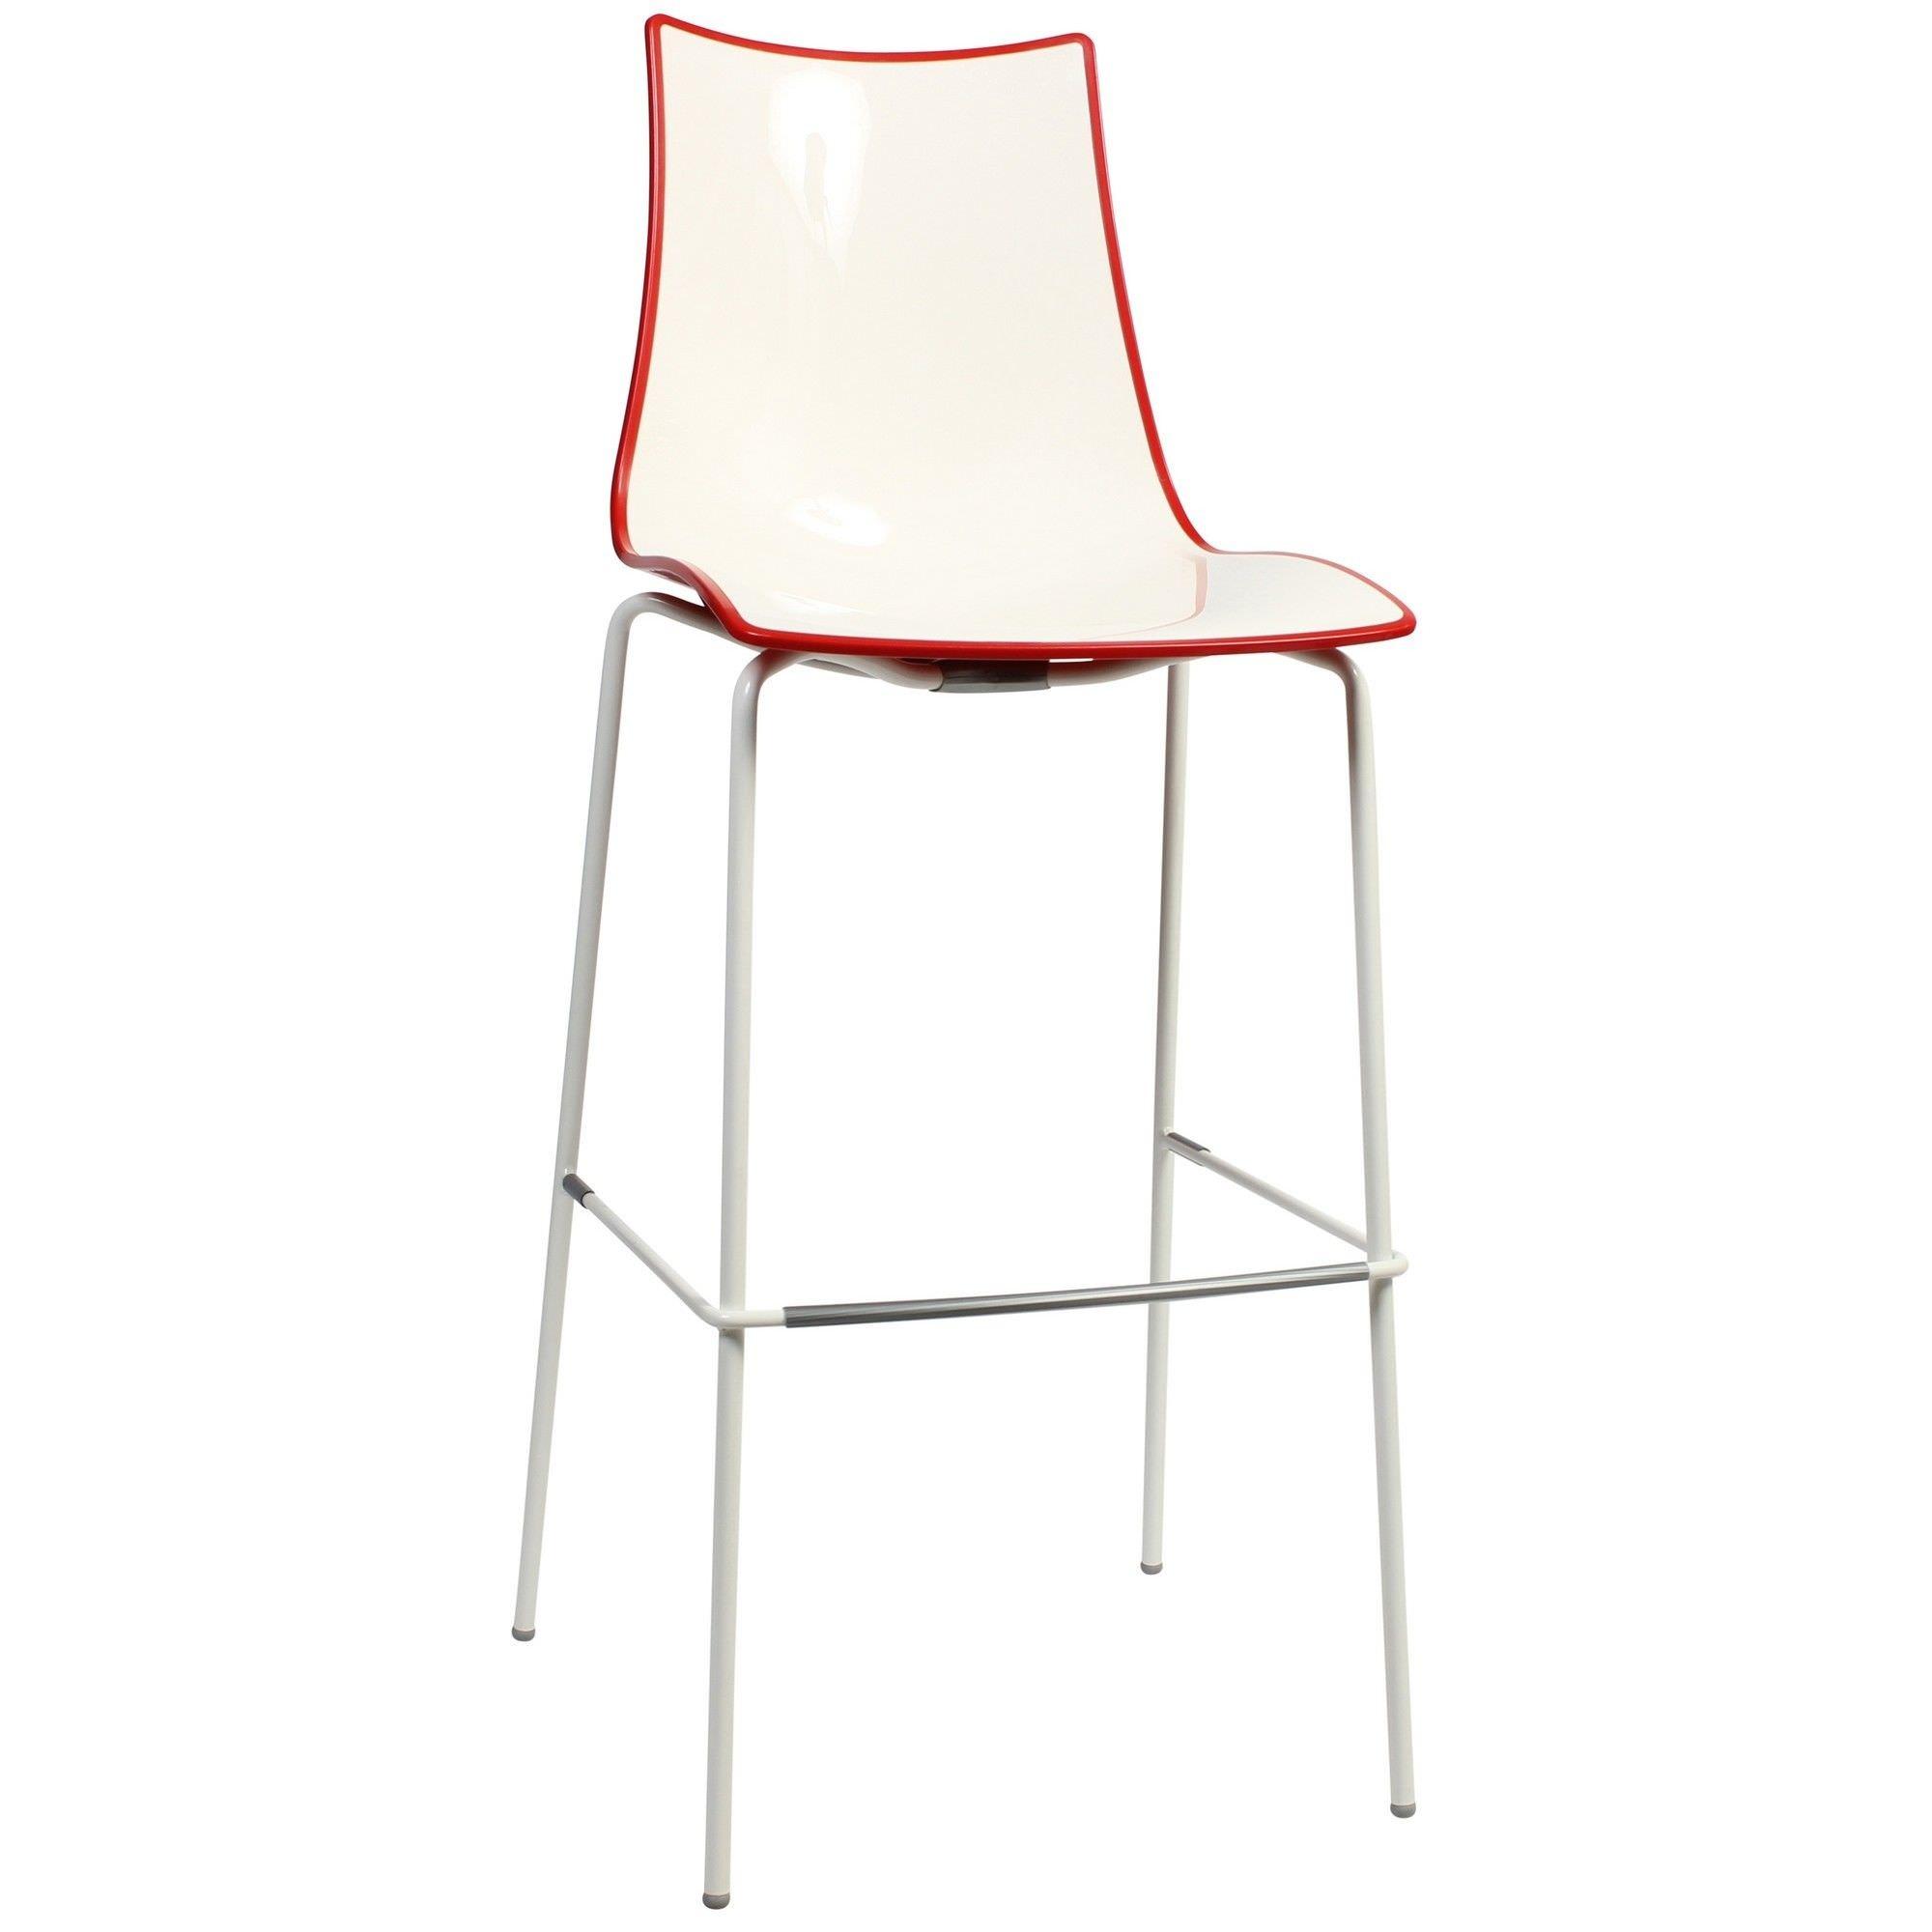 Zebra Bicolore Italian Made Commercial Grade Indoor/Outdoor Bar Stool, Metal Leg, Red / White